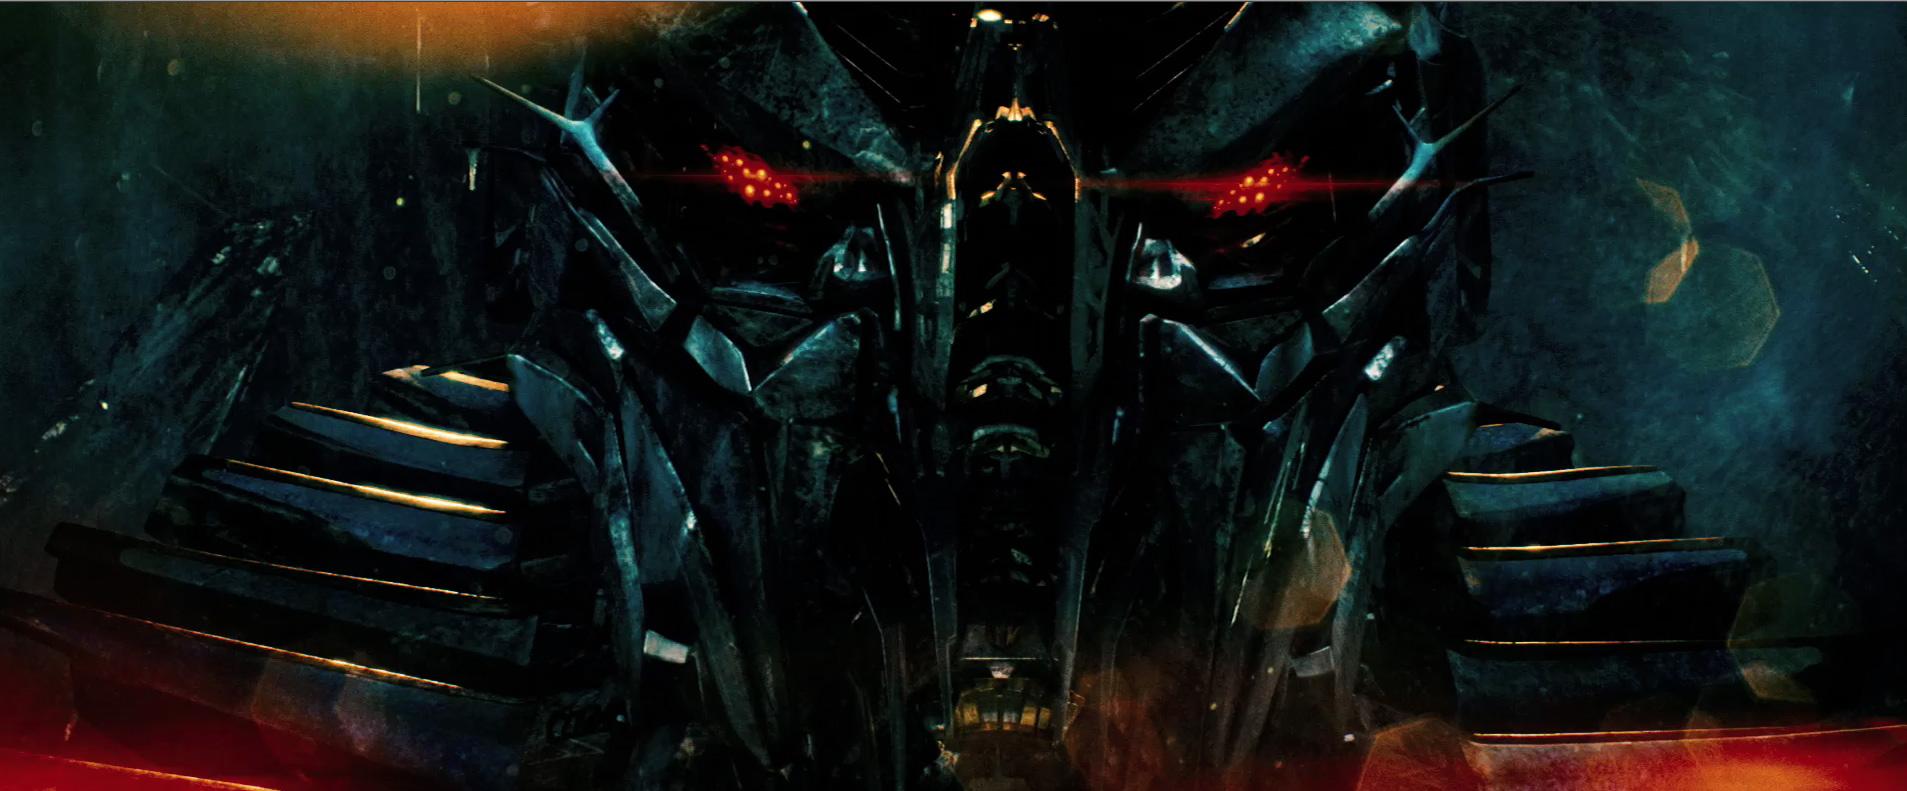 Transformers 3 - Megan Fox